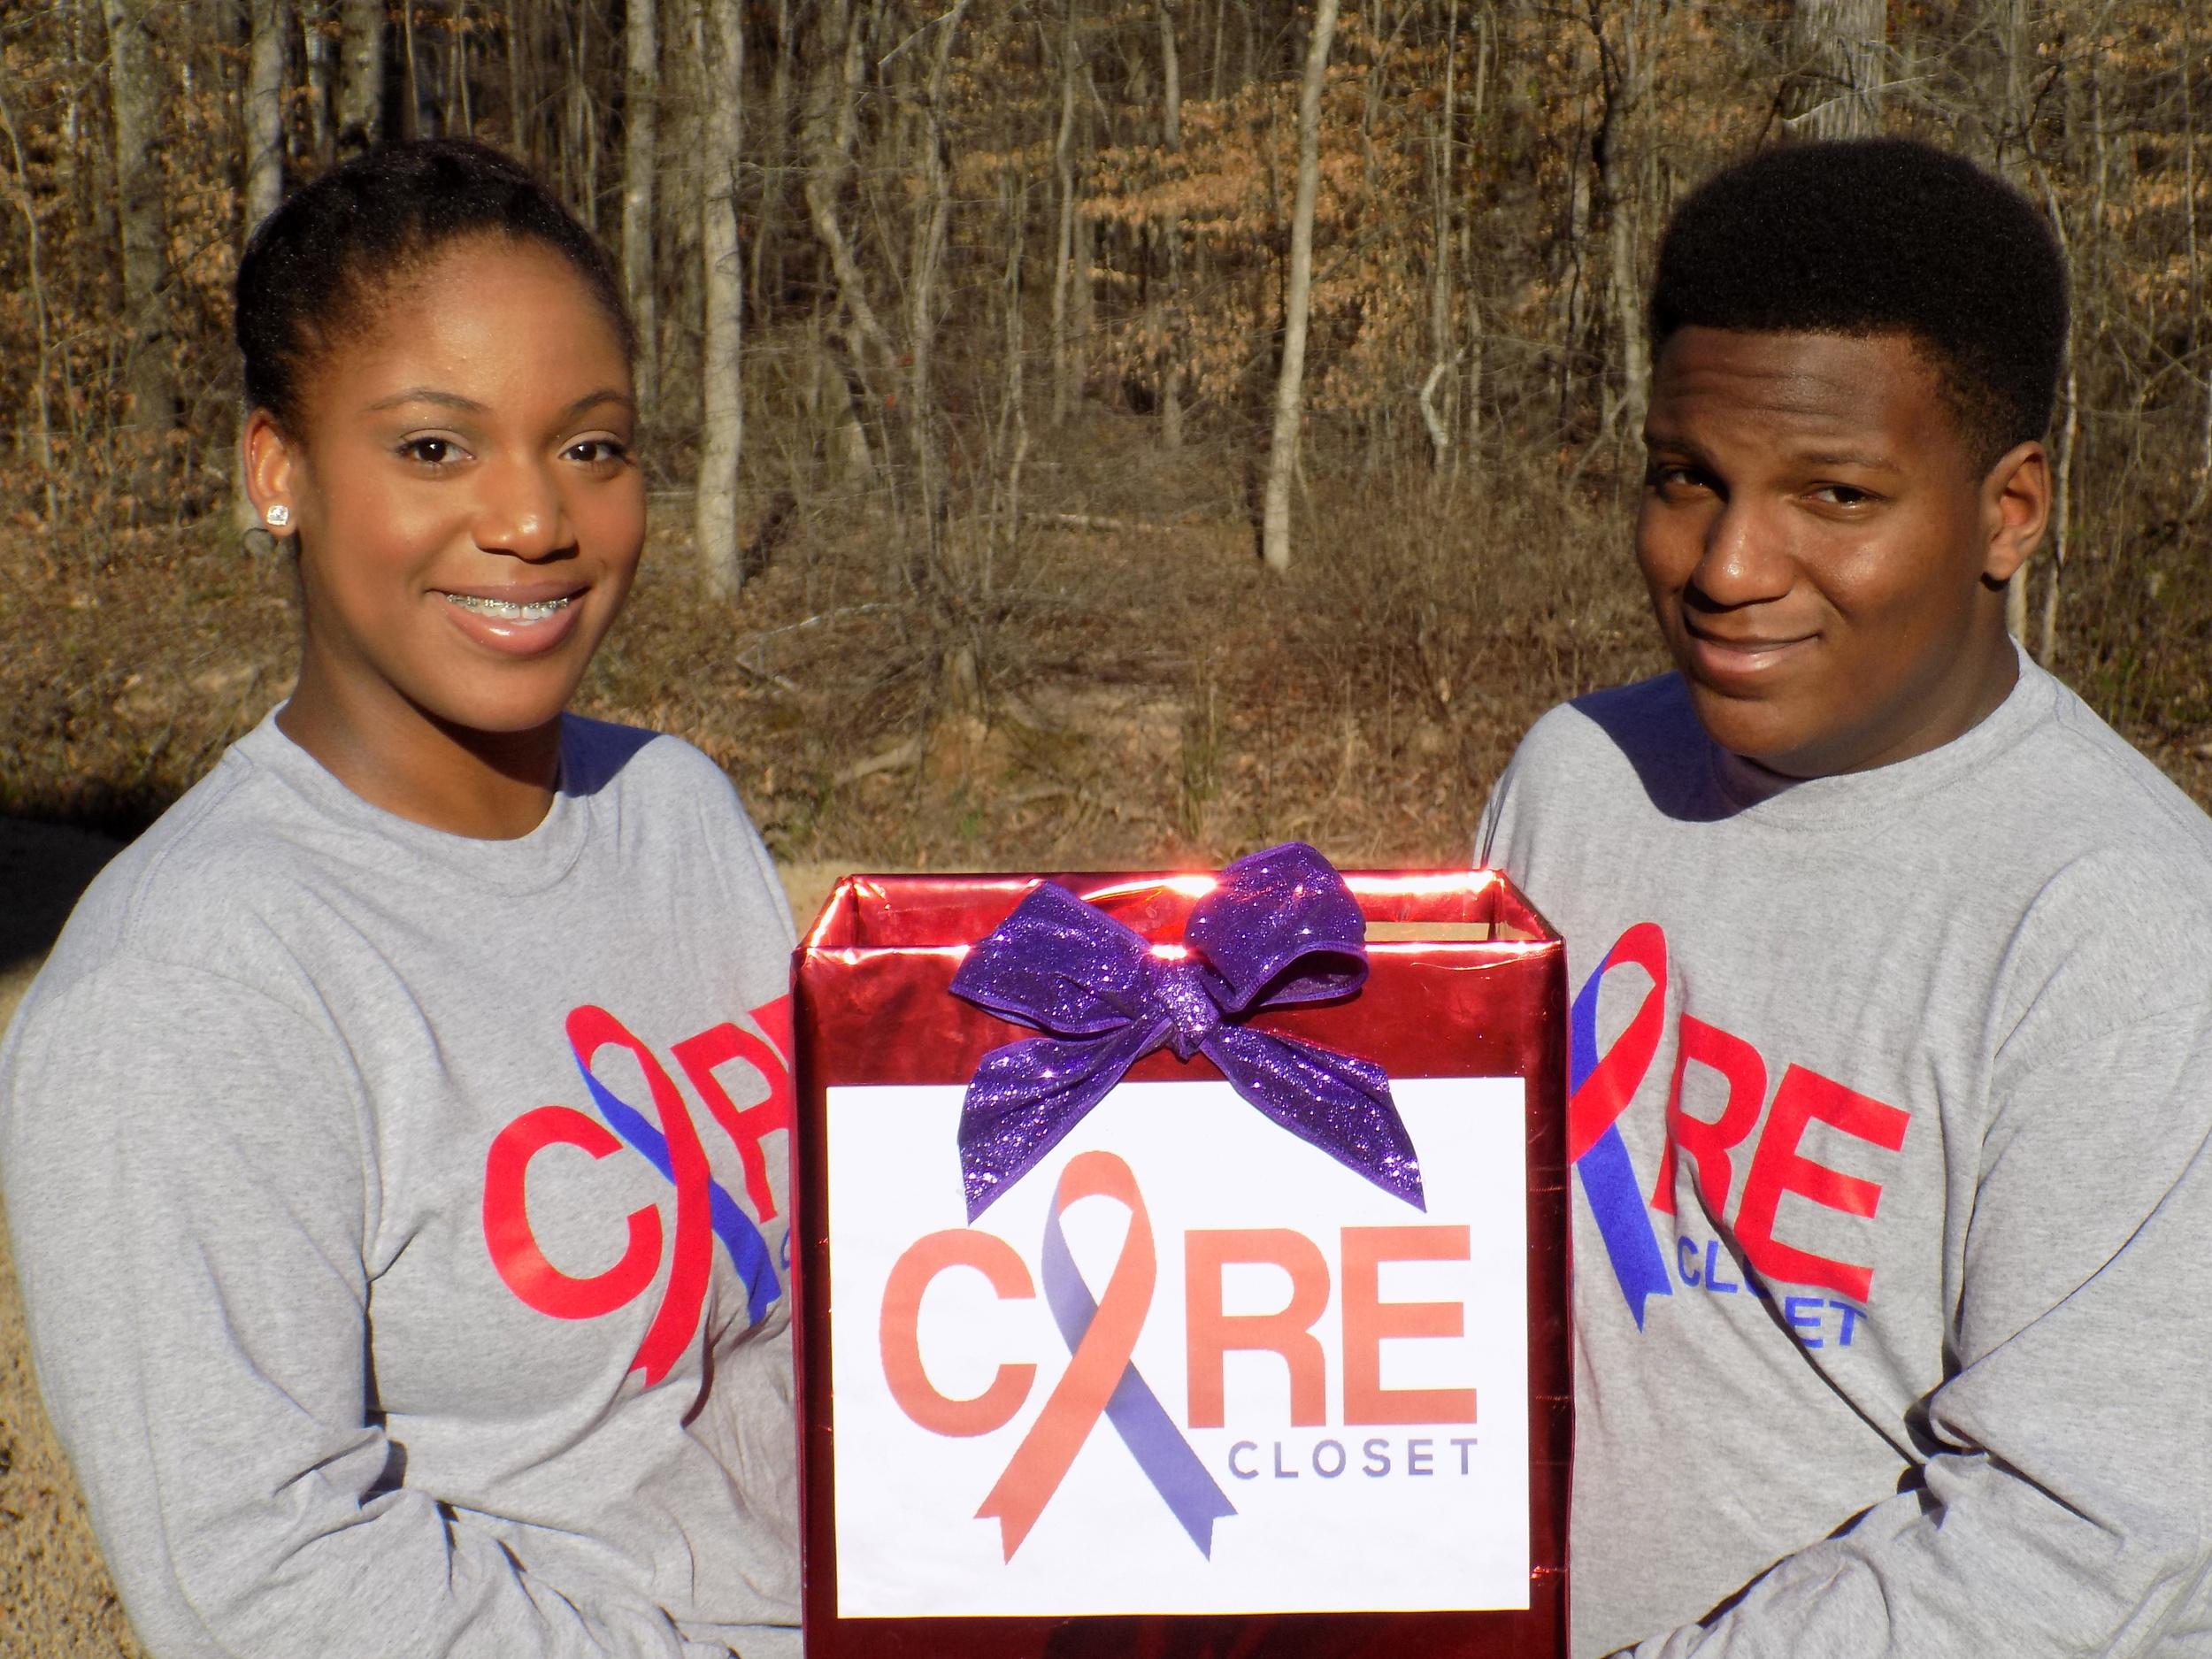 CARE Closet founders Lauren and Steven S.